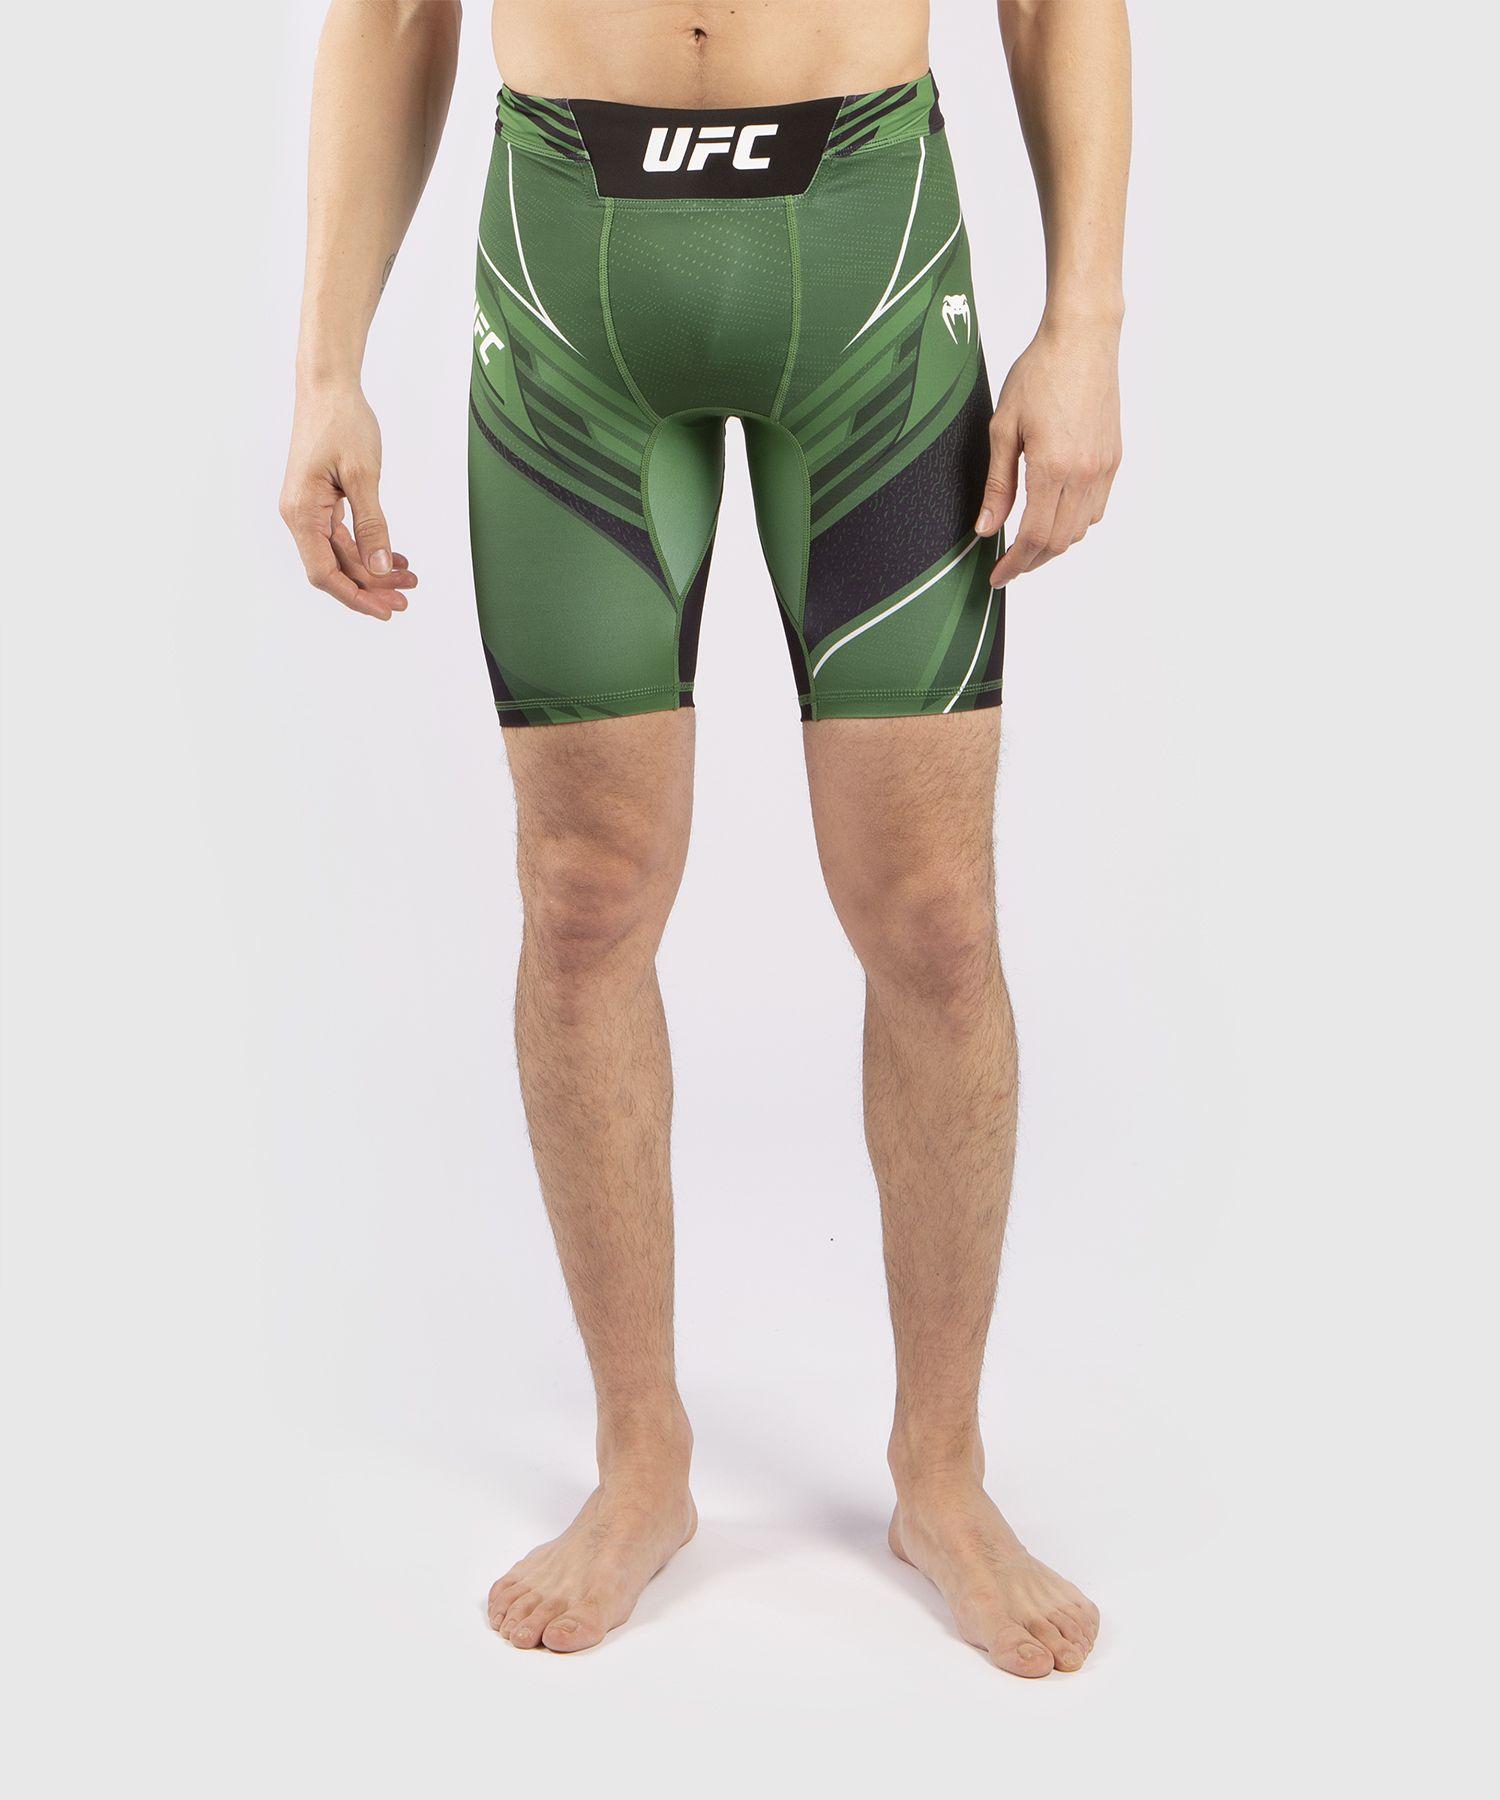 UFC Venum Pro Line Men's Vale Tudo Shorts - Green